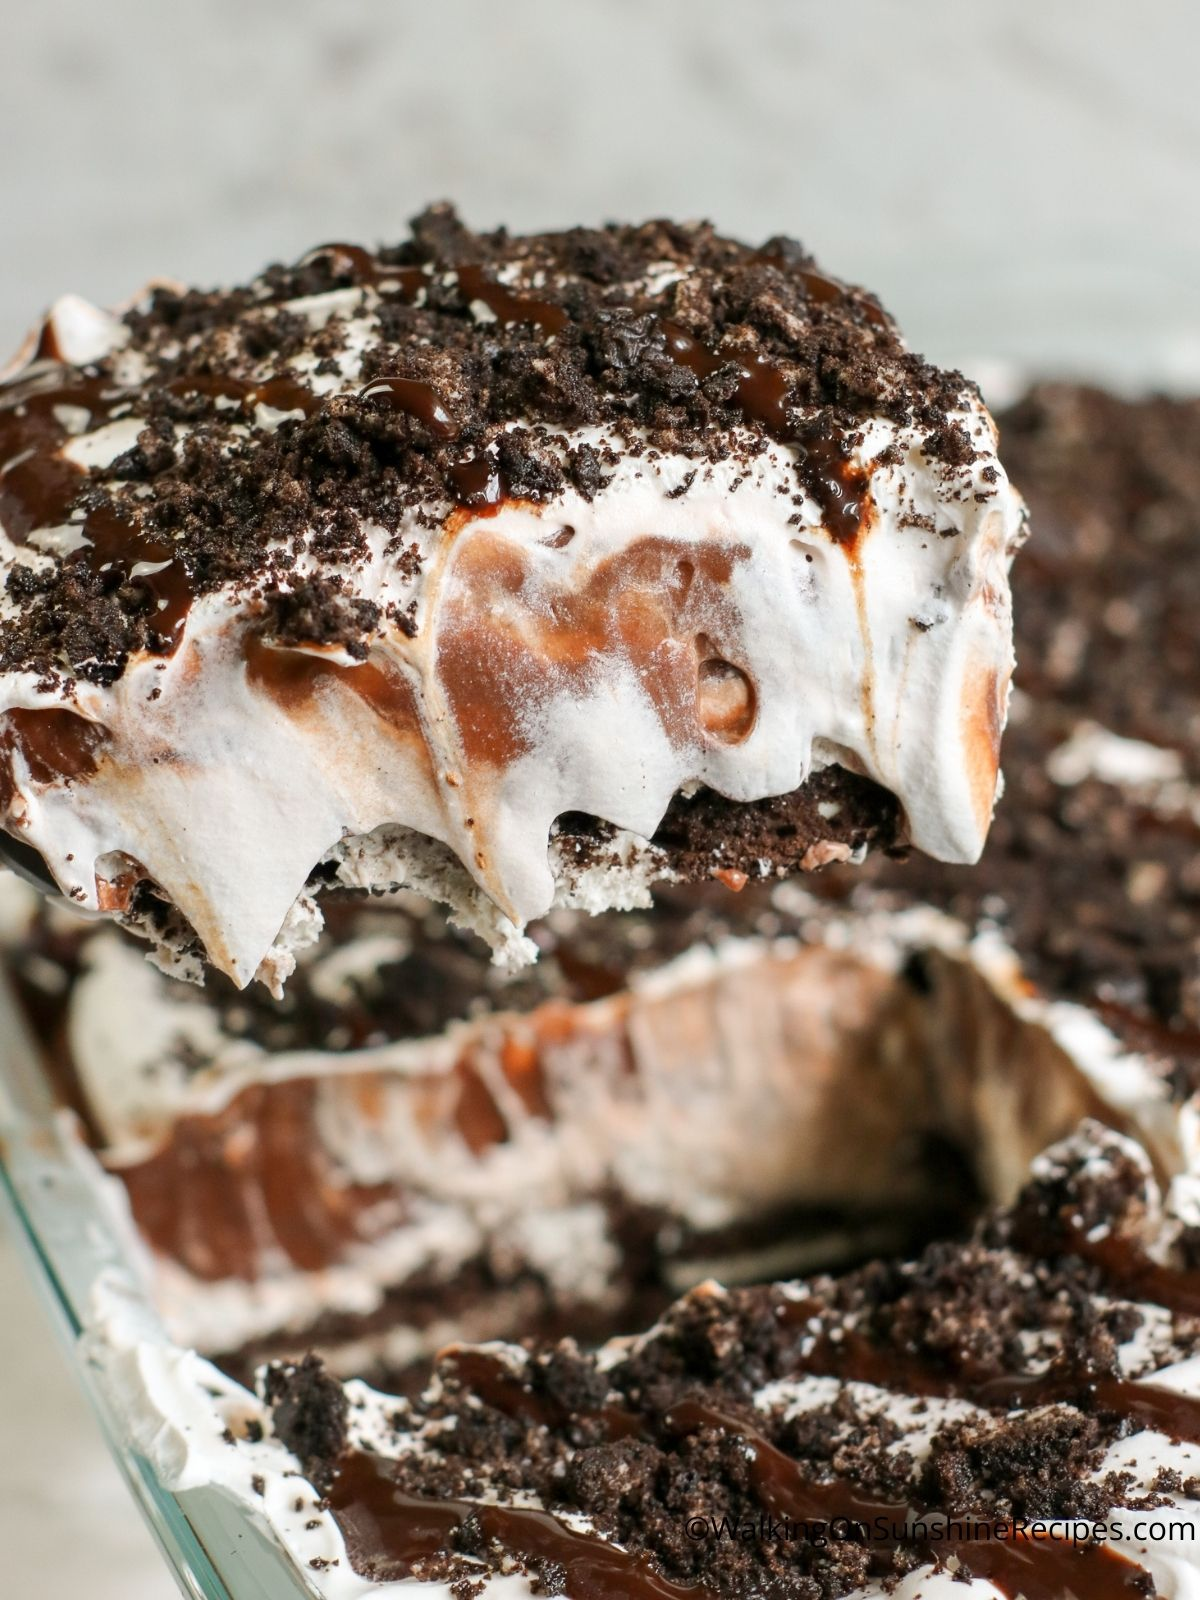 Gently lift pudding dessert on cake server.